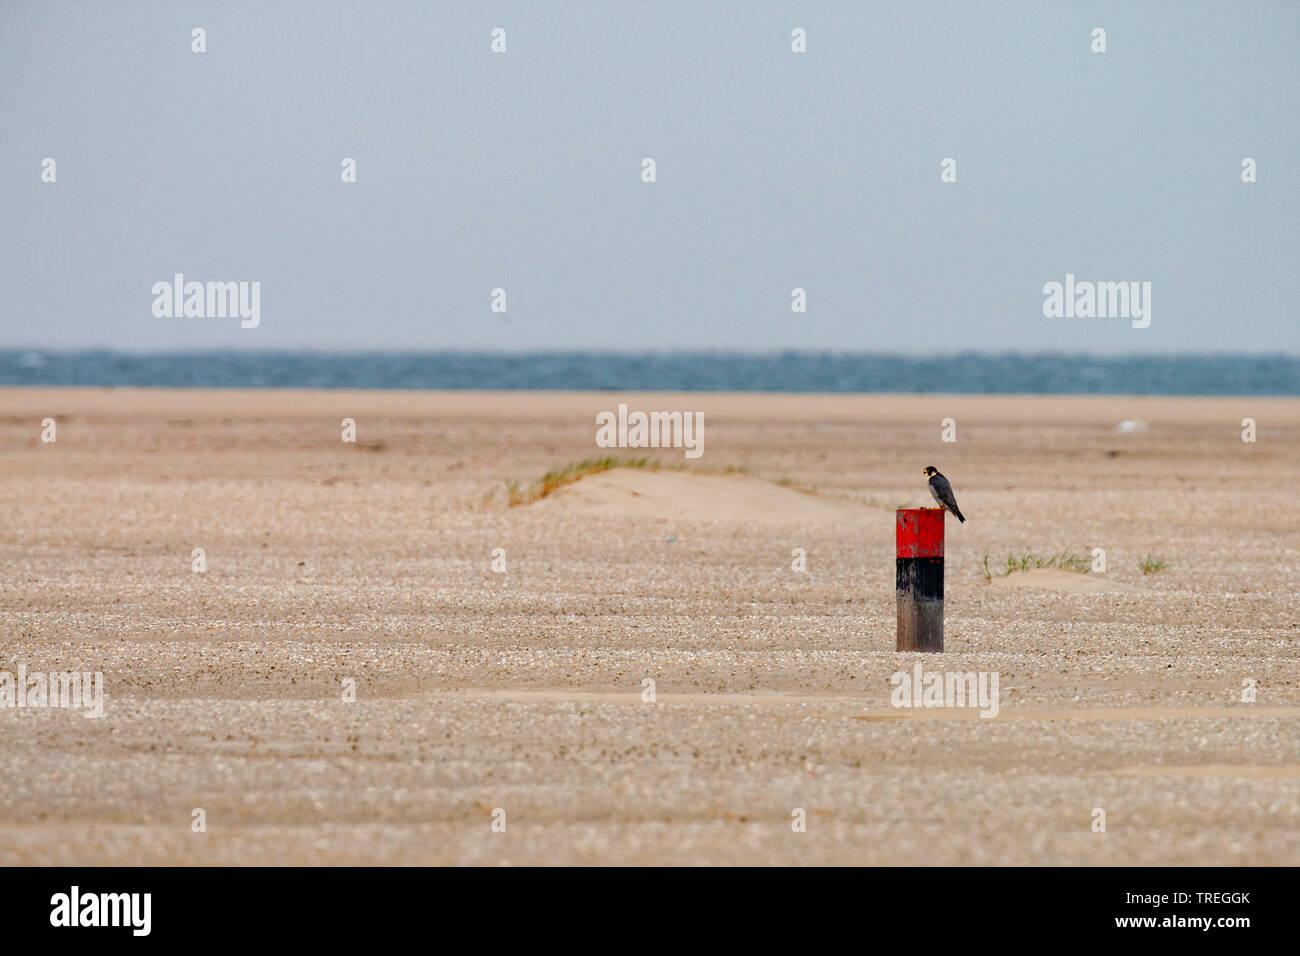 Wanderfalke, Wander-Falke (Falco peregrinus), auf einem Pfosten am Strand, Niederlande, Texel   peregrine falcon (Falco peregrinus), on a post on the - Stock Image